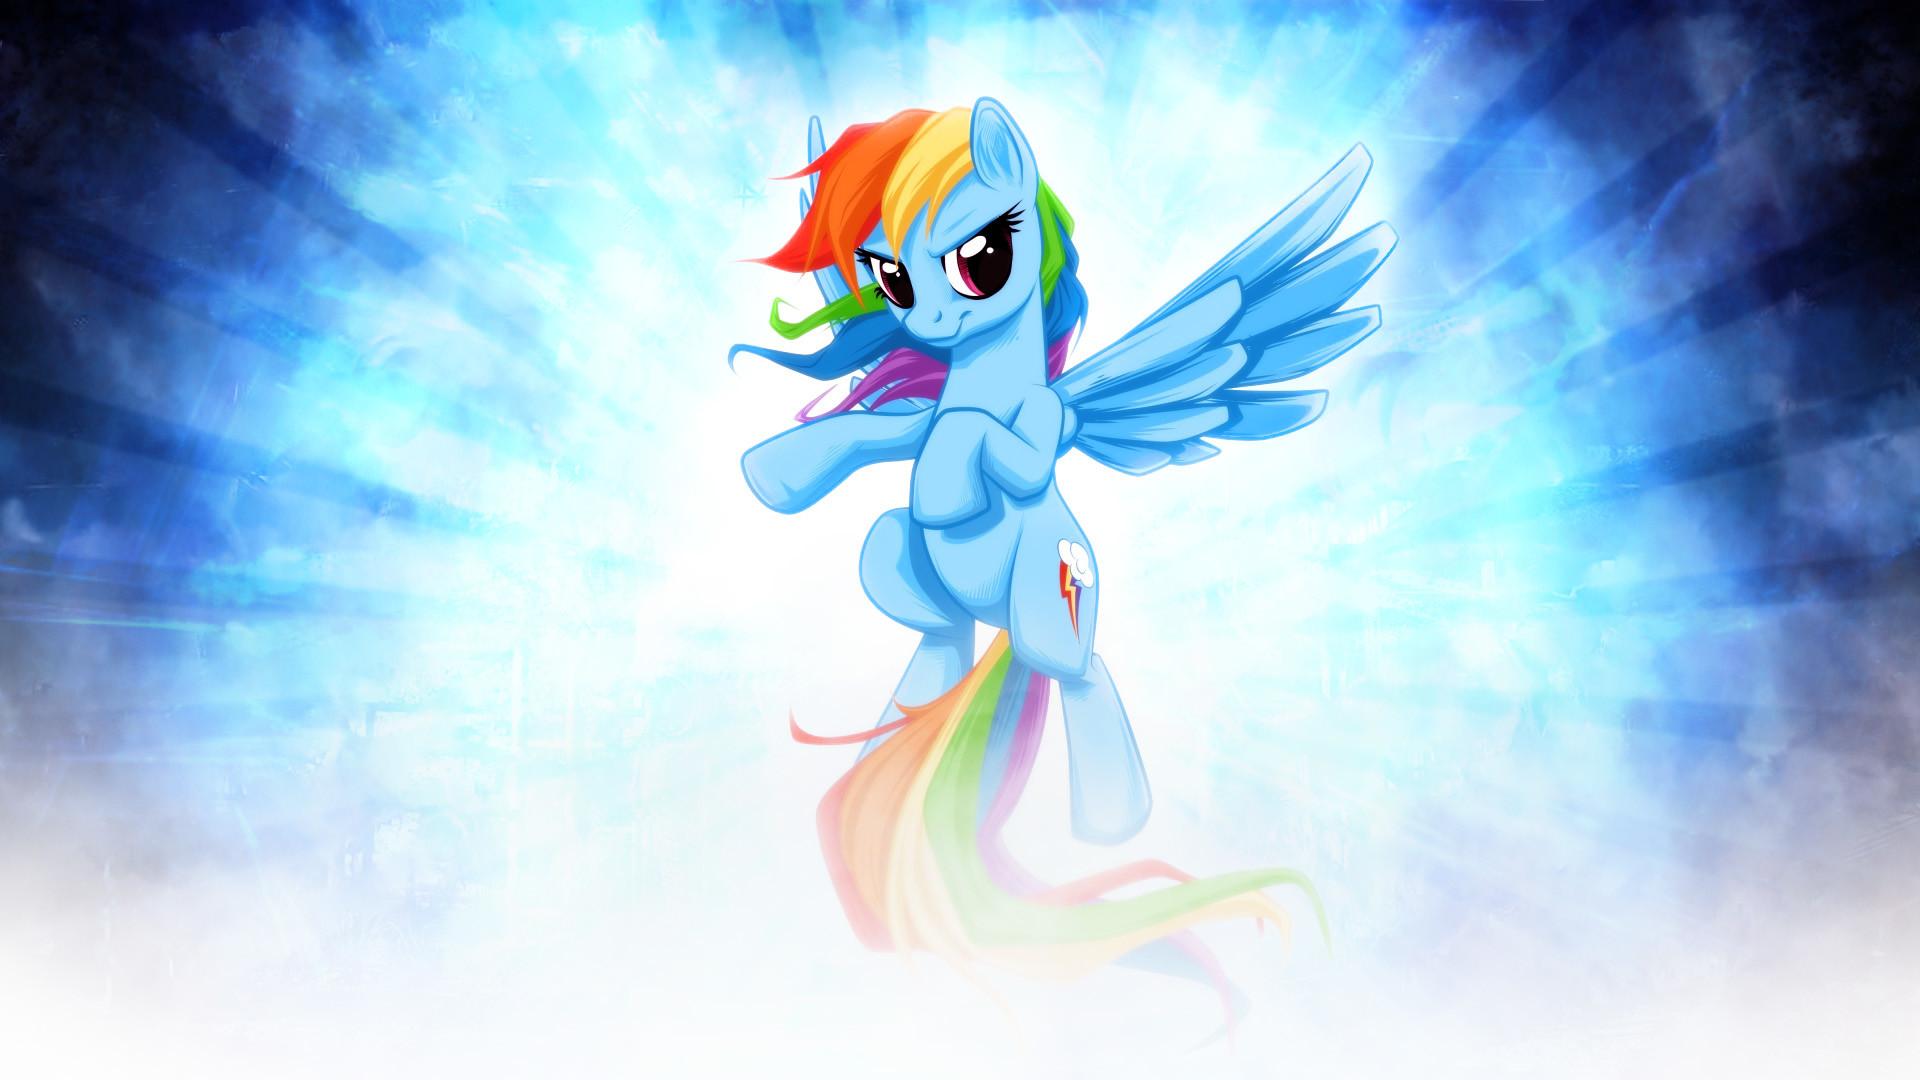 Animated Wallpaper Windows 8 Free My Little Pony Rainbow Dash Wallpaper 82 Images